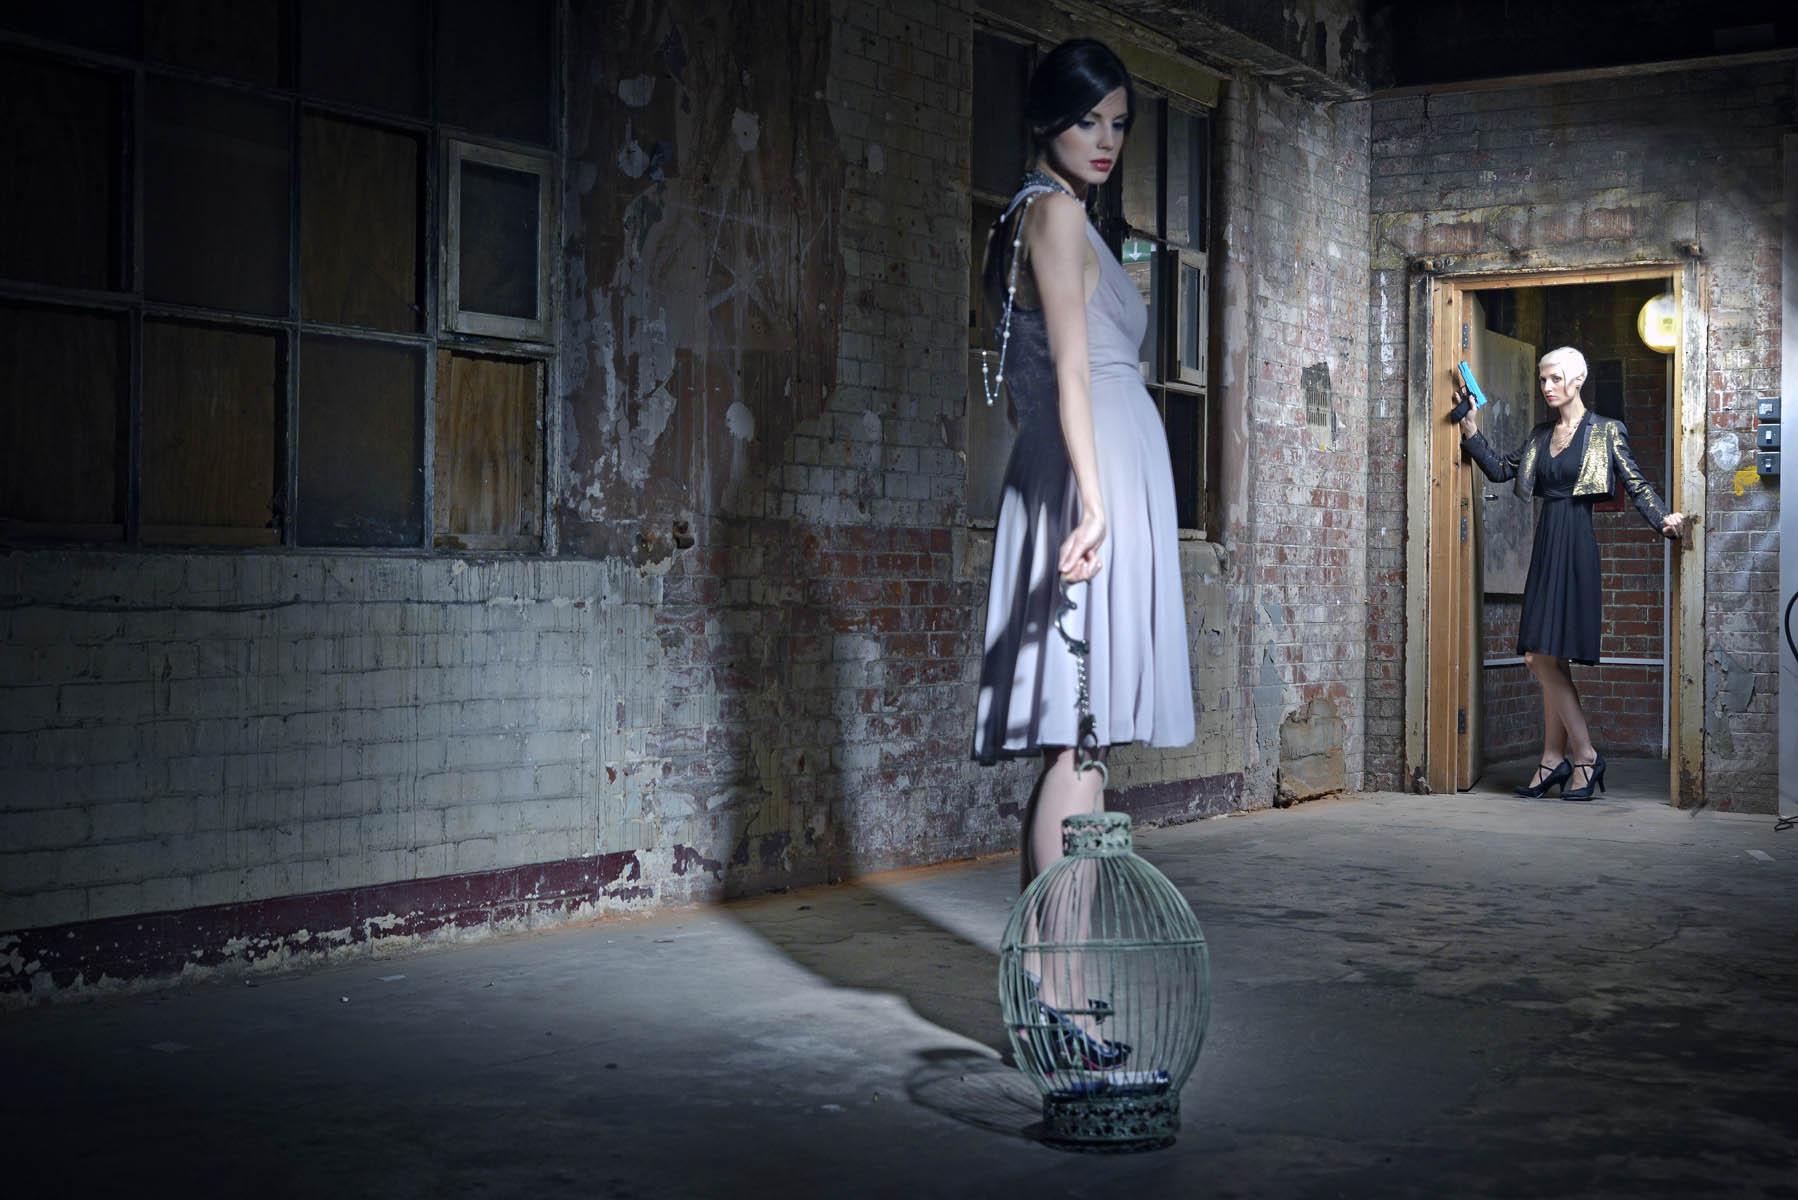 Fashion Lifestyle Photographer London 8 Music Video Production London